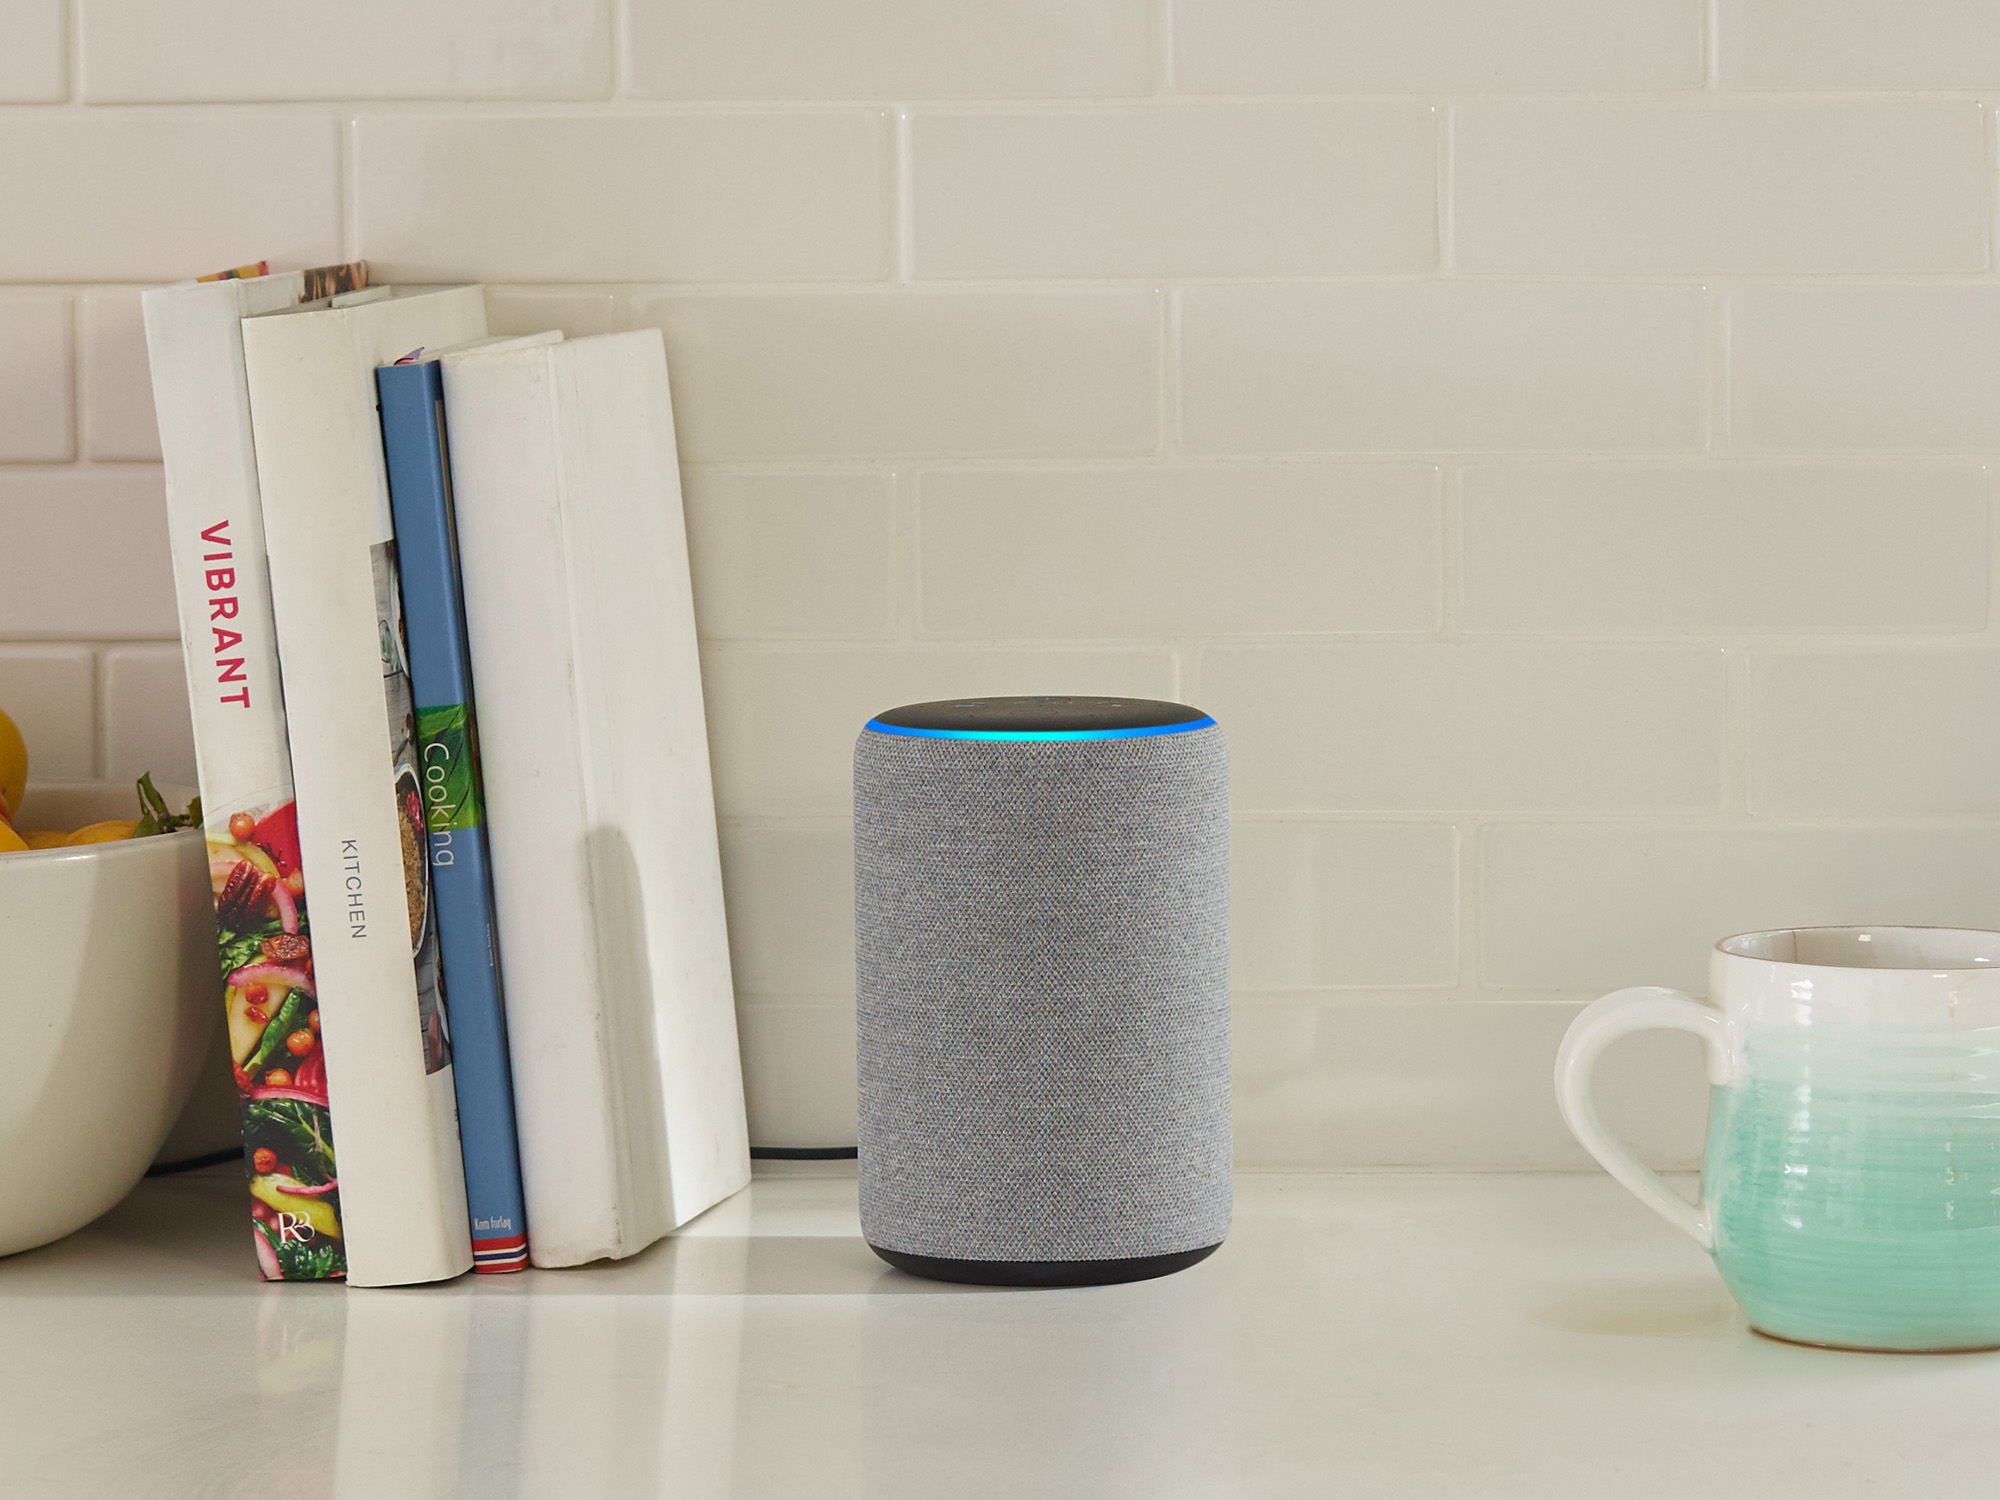 Amazon's Echo Plus ($149.99) has a Zigbee smart home hub built in.